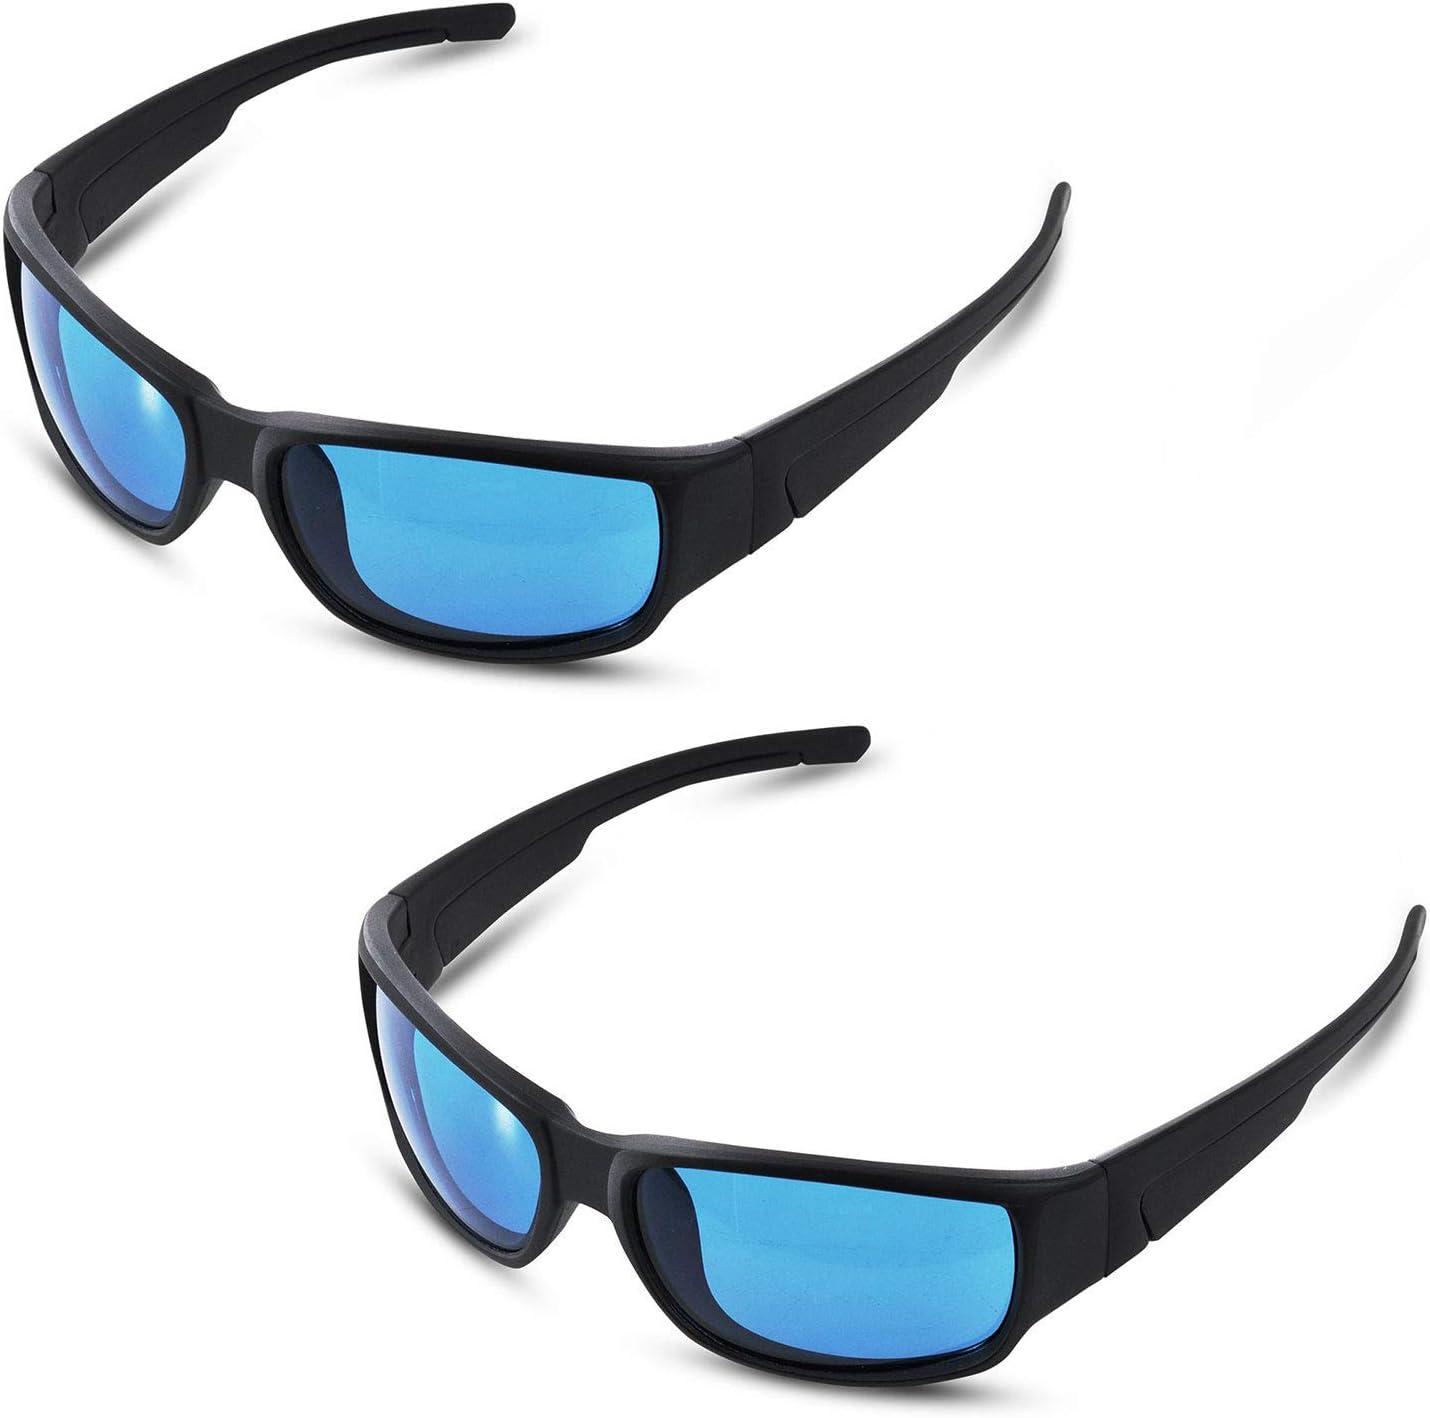 VIVOSUN Indoor Hydroponics Grow Room Tent Glasses HPS MH Light Goggles Anti UV